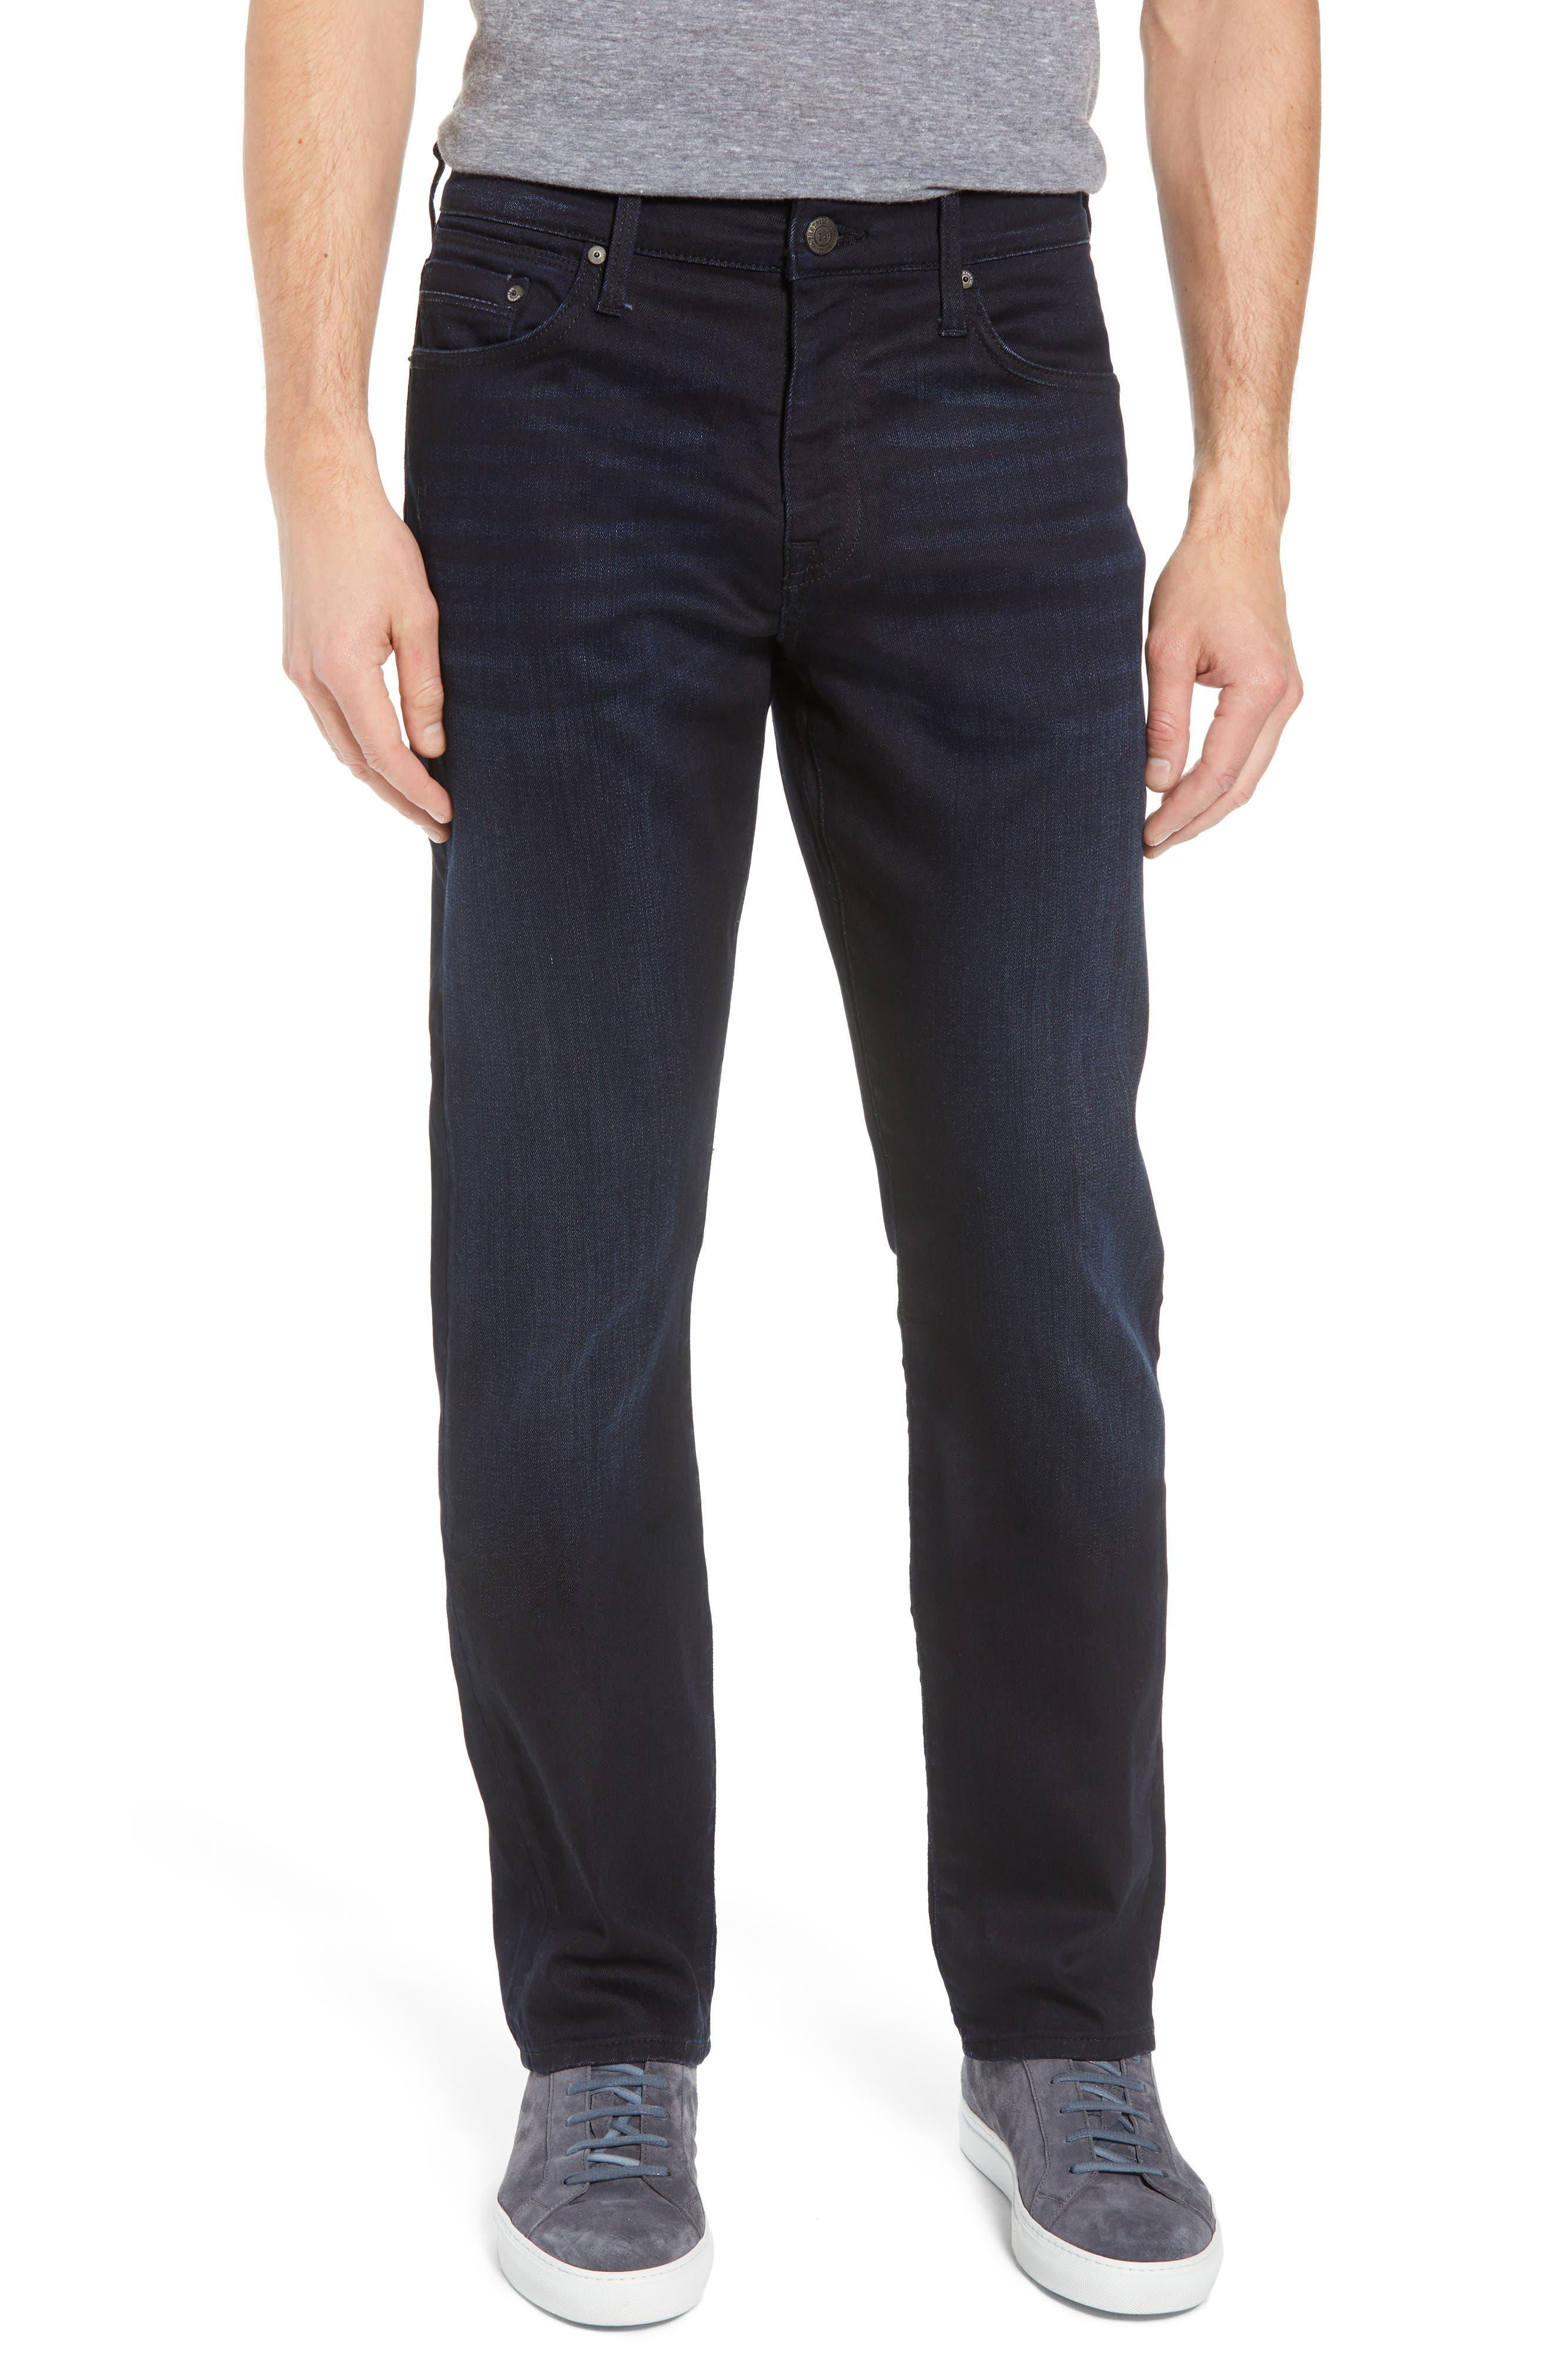 Matt Relaxed Fit Jeans,                             Main thumbnail 1, color,                             DEEP CAPITOL HILL